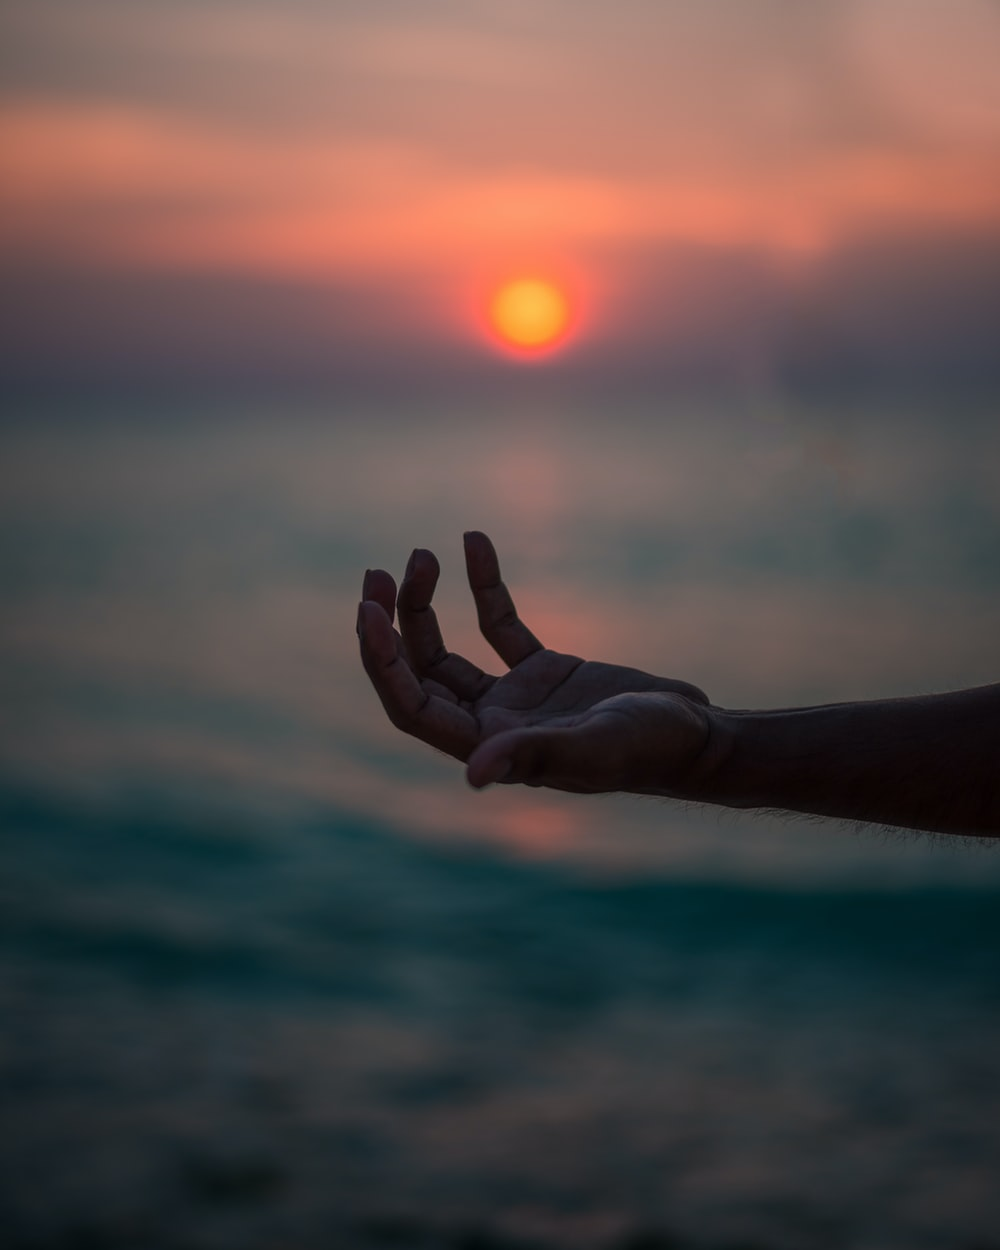 human hand near body of water